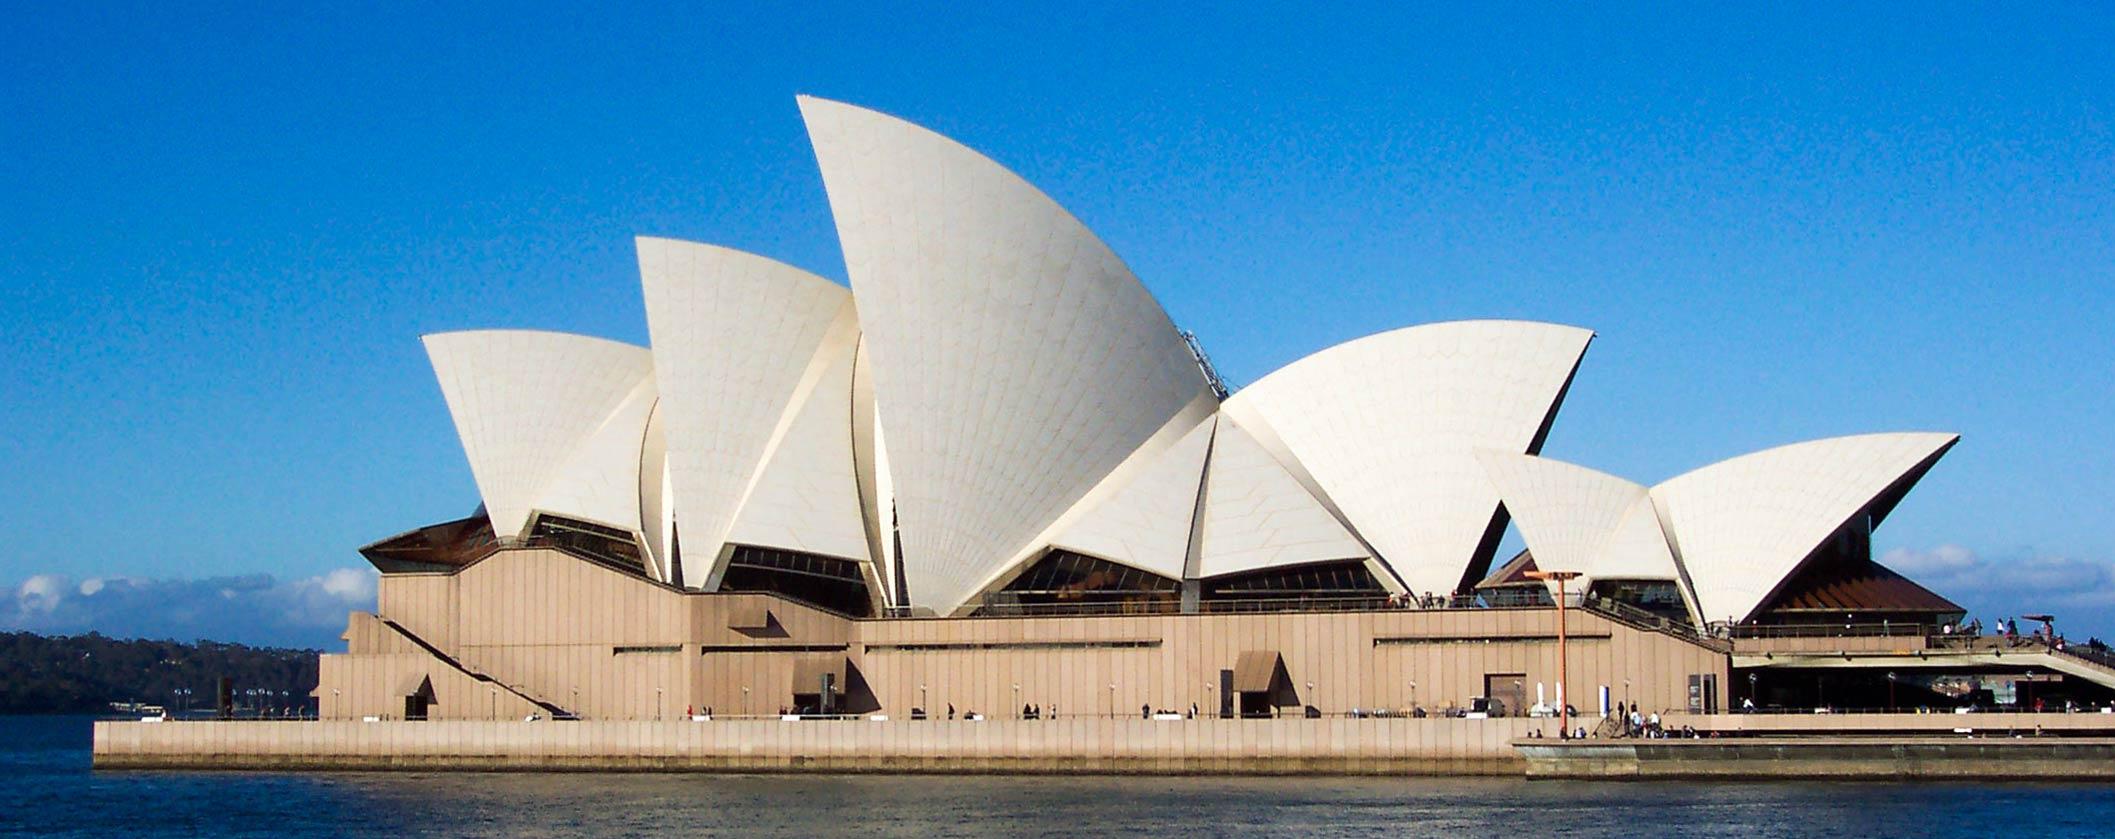 Sydney Opera House Harbour